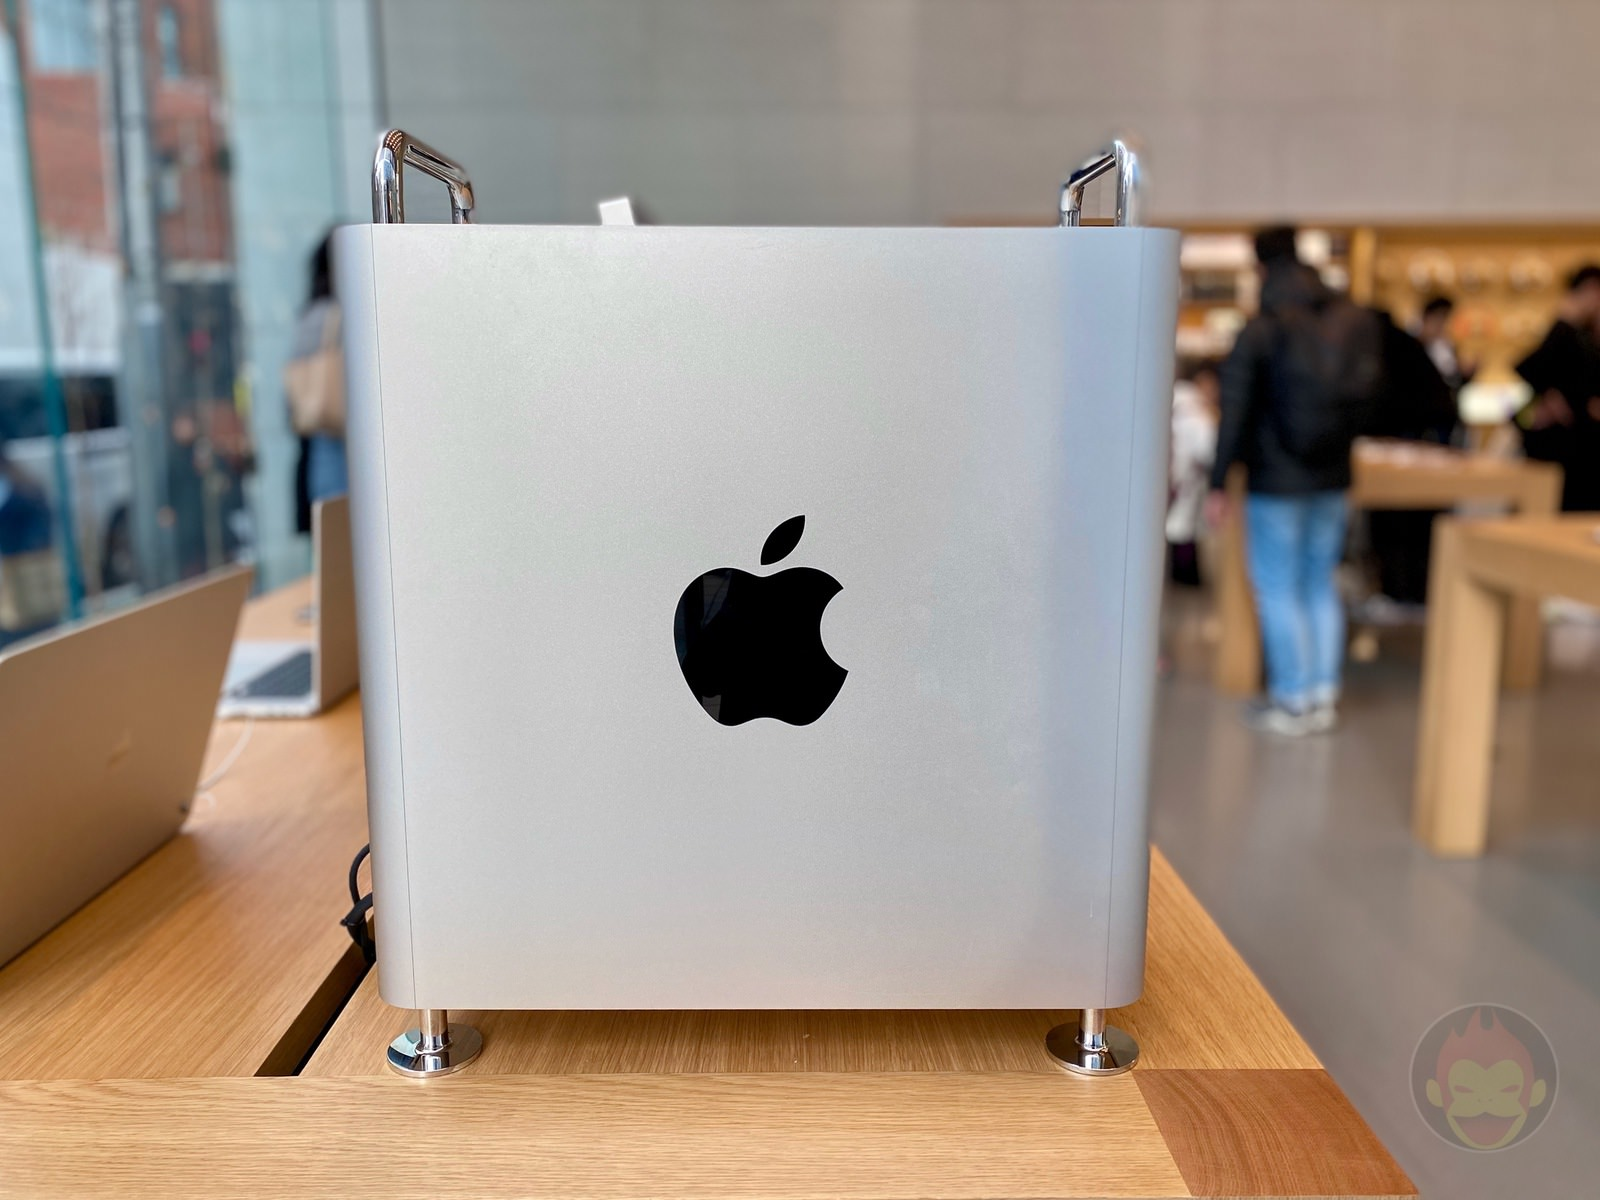 Mac Pro Pro Display XDR Apple Omotesando 11